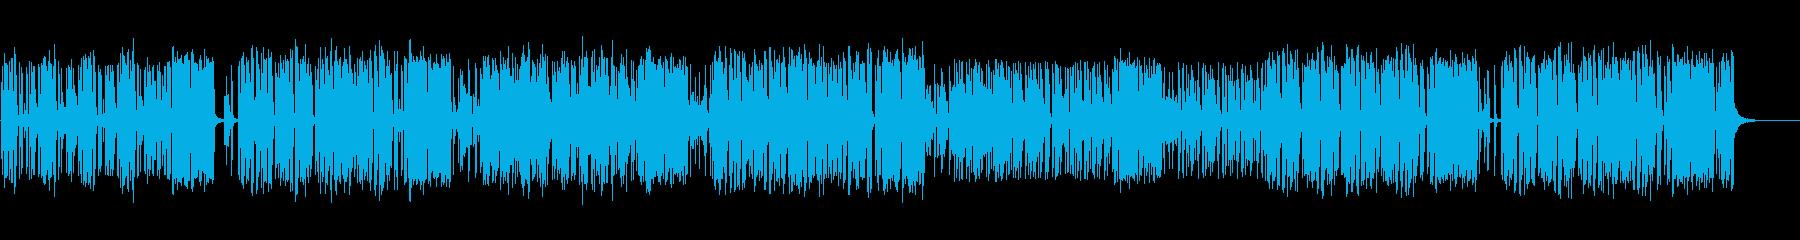 Soul センチメンタル 感情的 ...の再生済みの波形